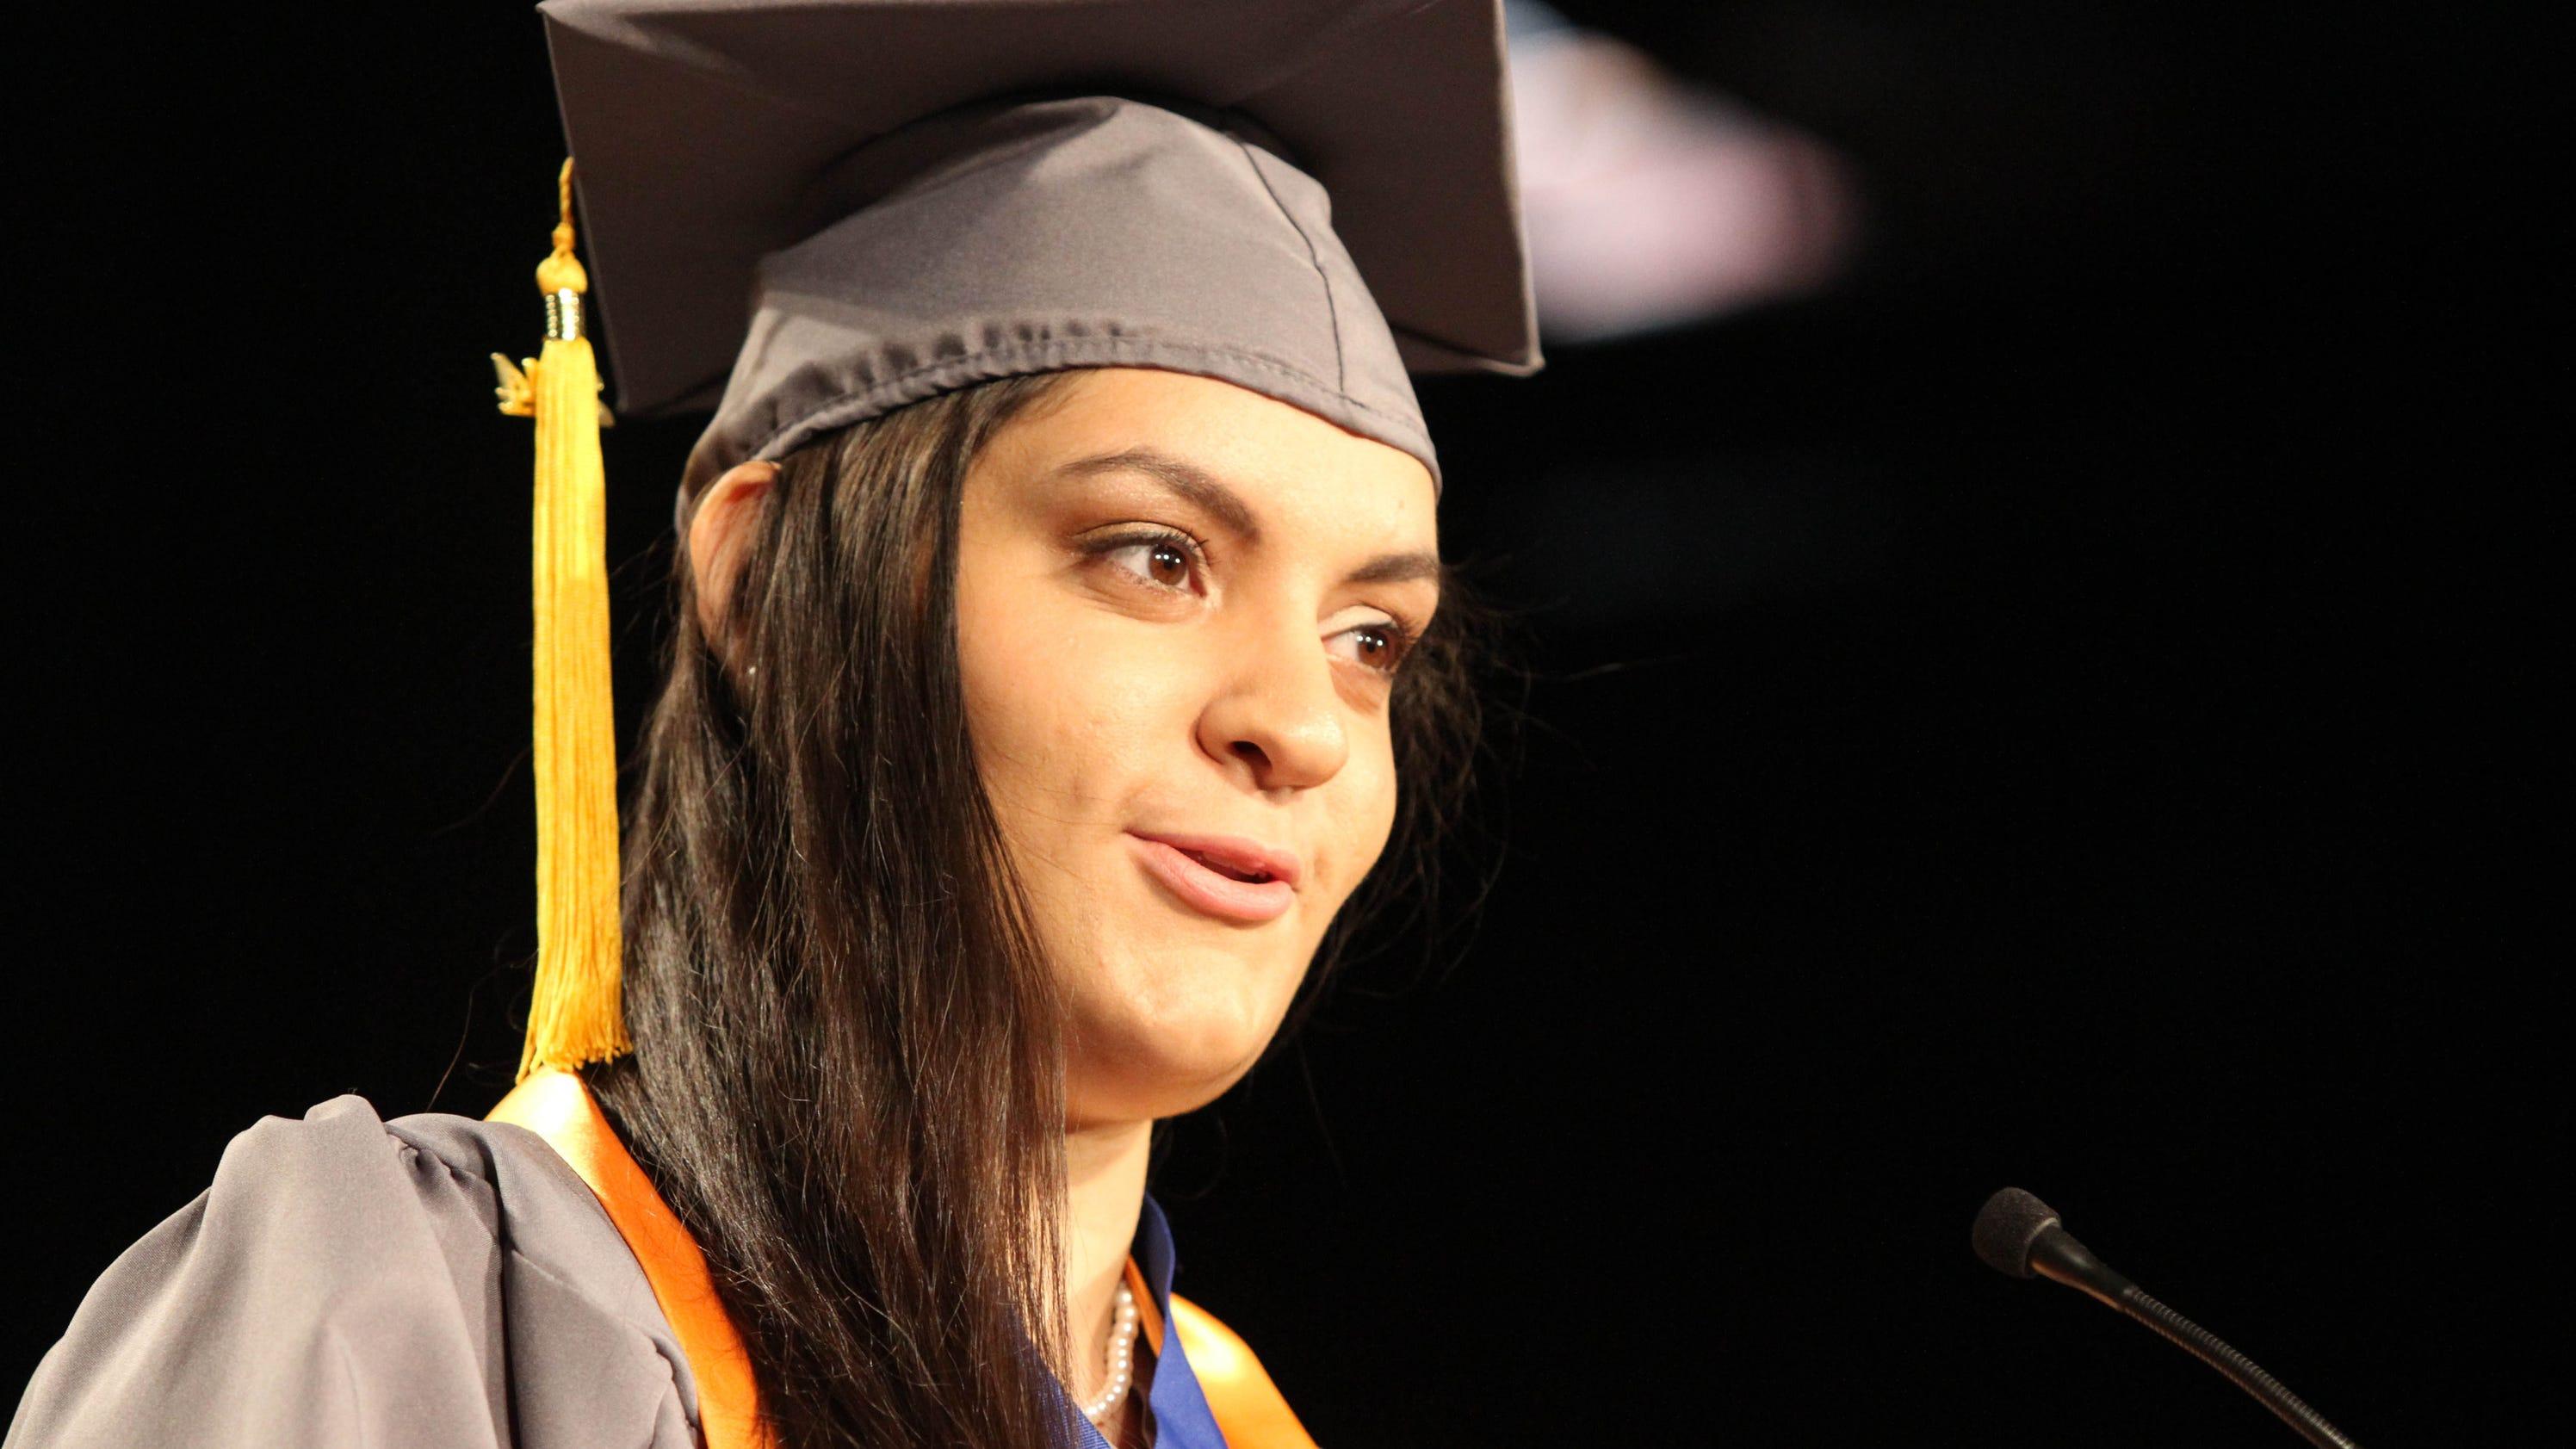 middlesex community college 2014 graduation